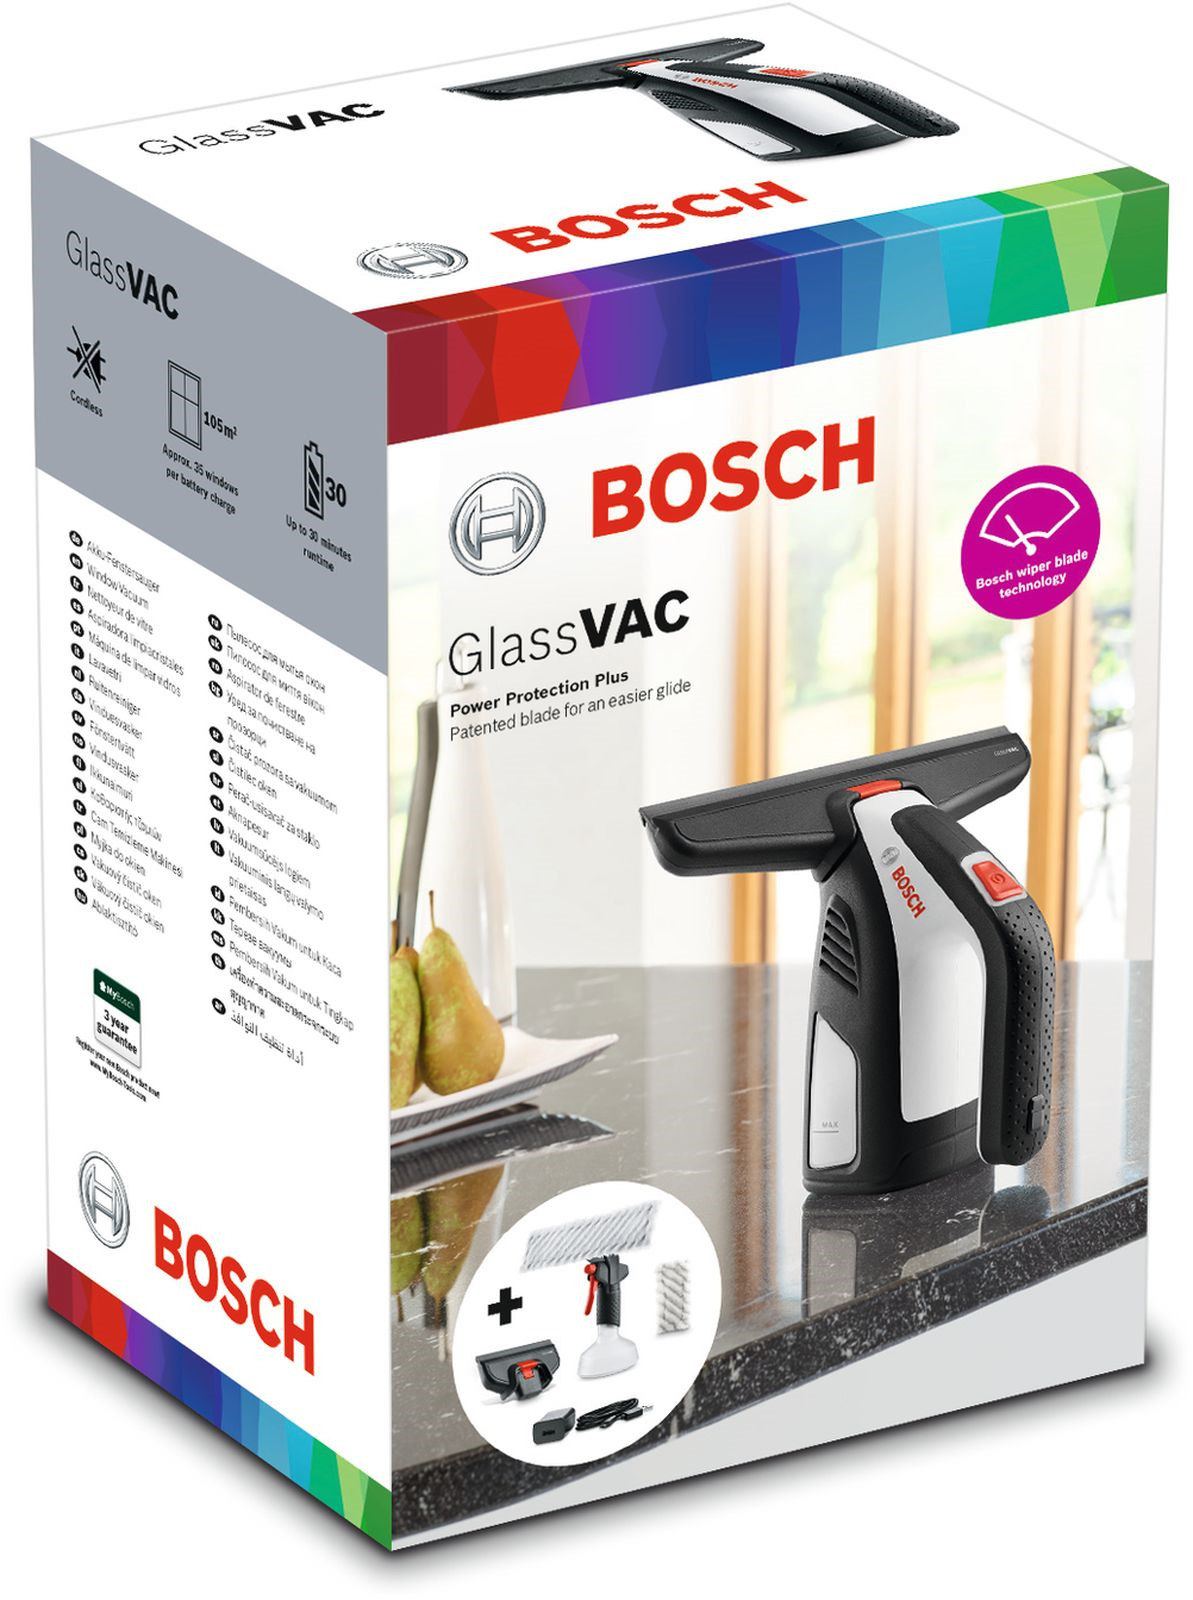 Стеклоочиститель Bosch GlassVAC Solo Bosch